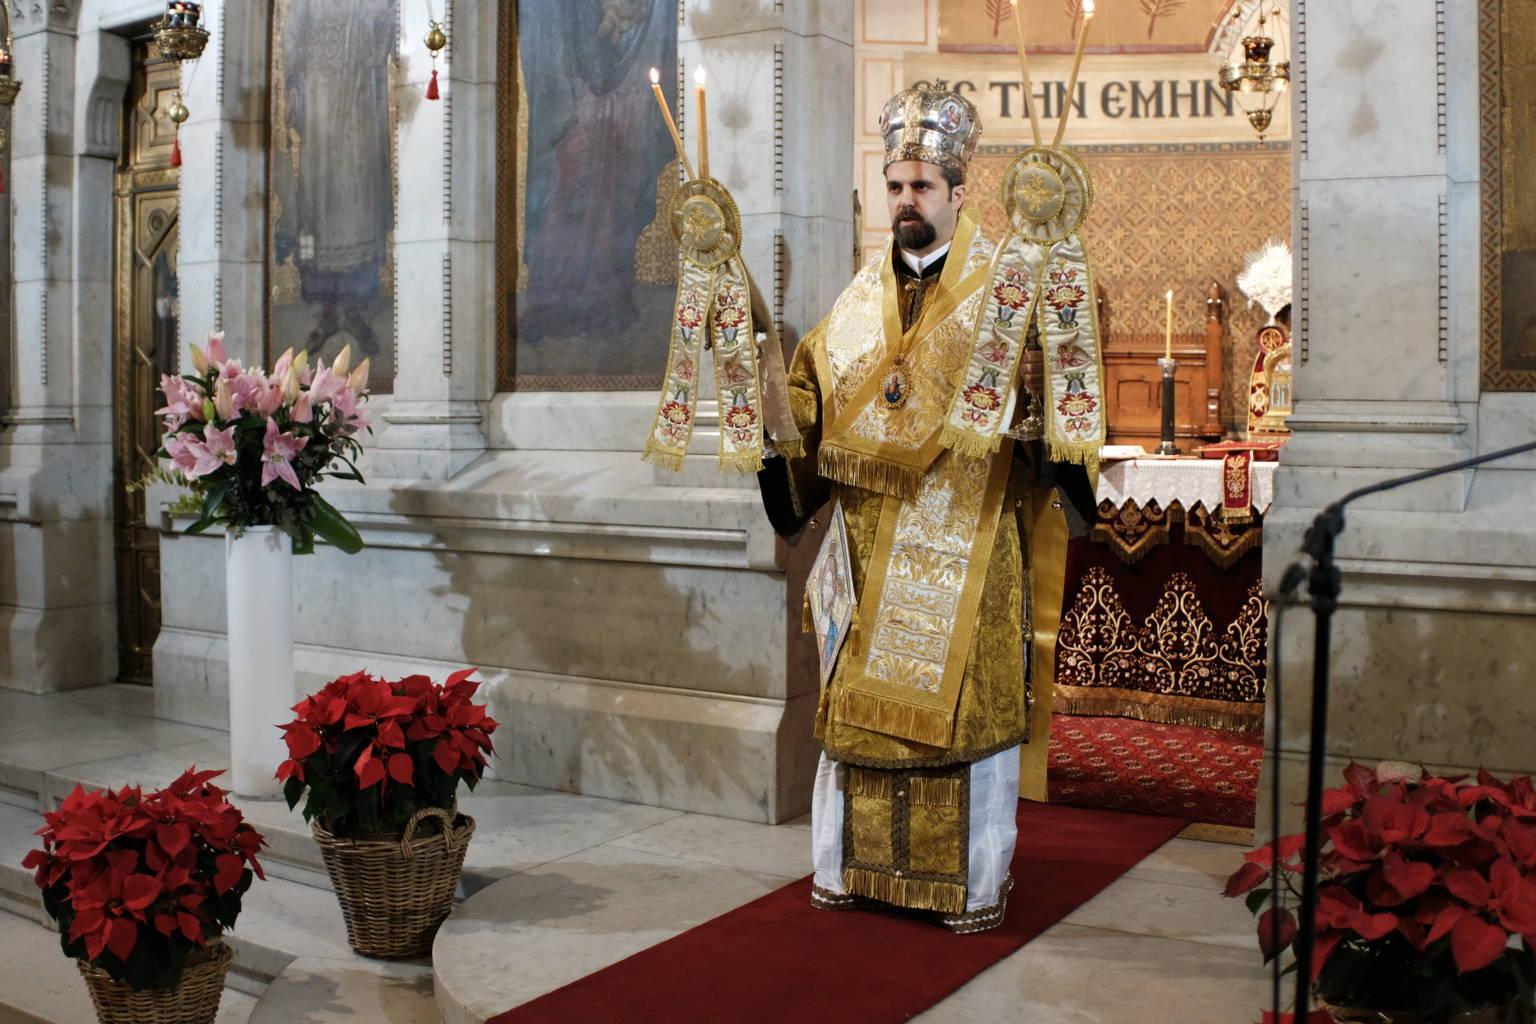 DSCF2805 - Επίσκοπος Μελιτηνής: η θυσιαστική πορεία των Χριστιανών αποτελεί καταξίωση